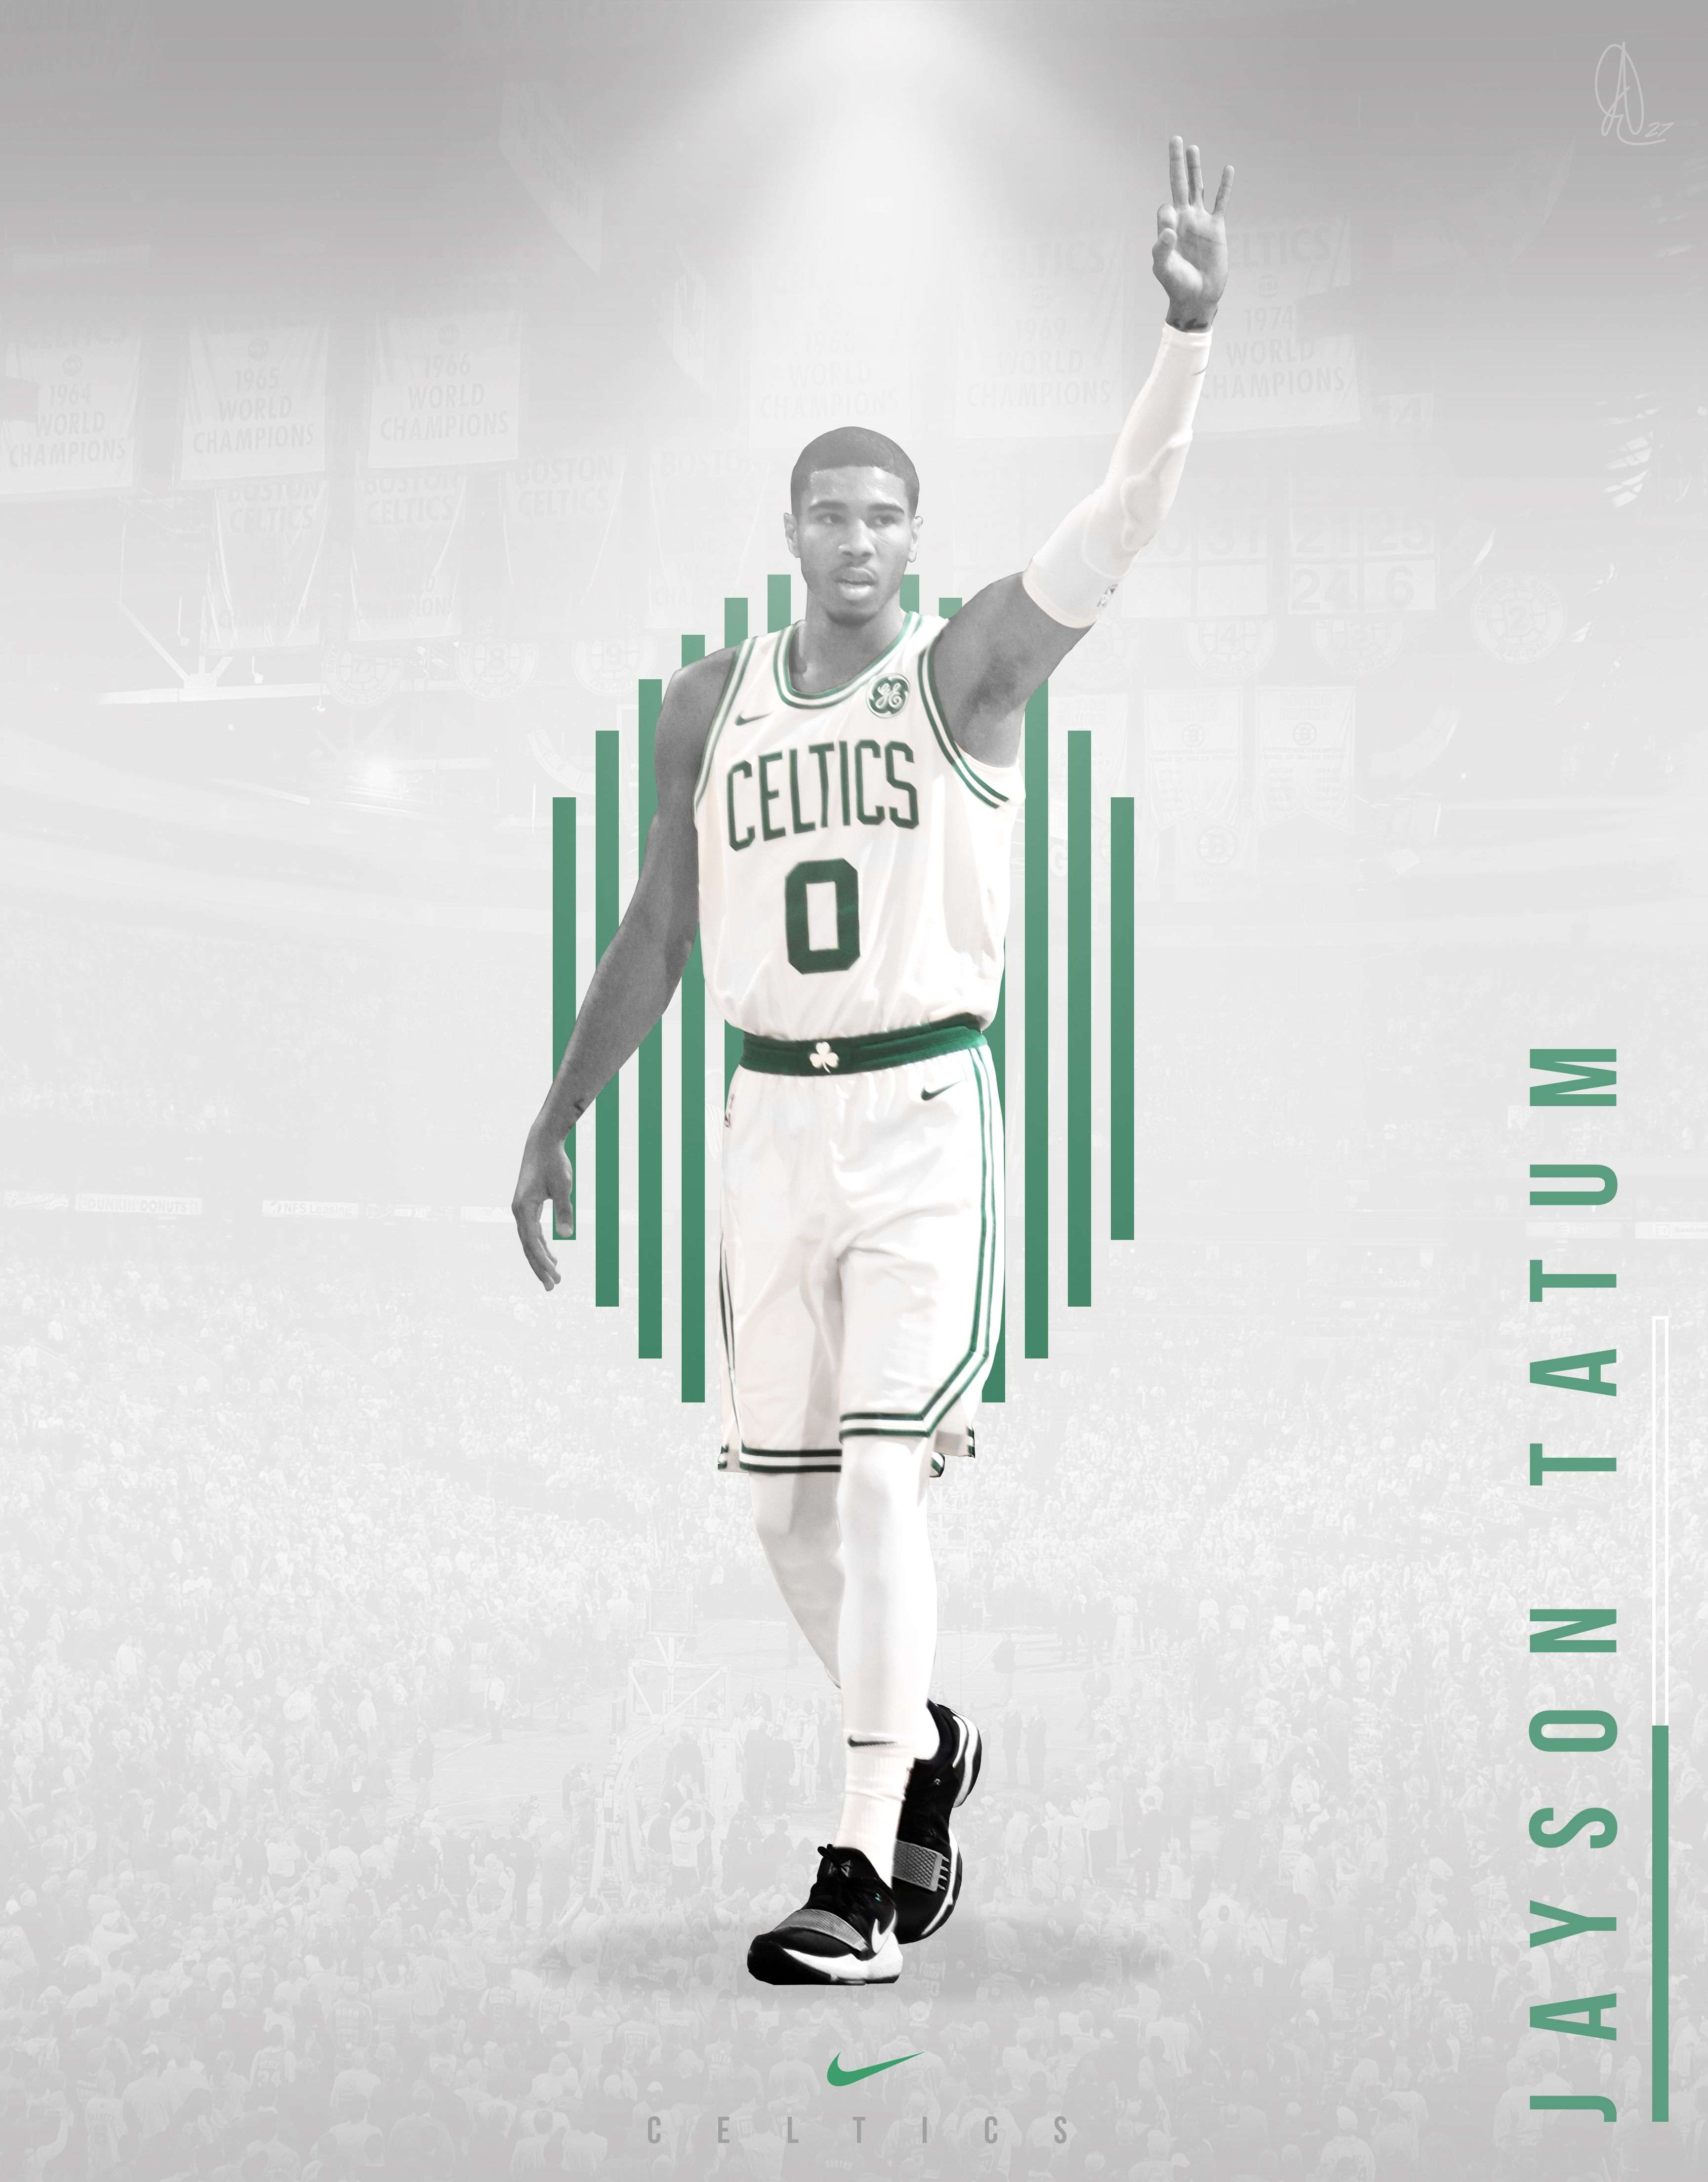 Jayson Tatum Sf 0 Boston Celtics If You Appreciate My Work Feel Free To Follow Me On Any Of Boston Celtics Wallpaper Basketball Background Jayson Tatum